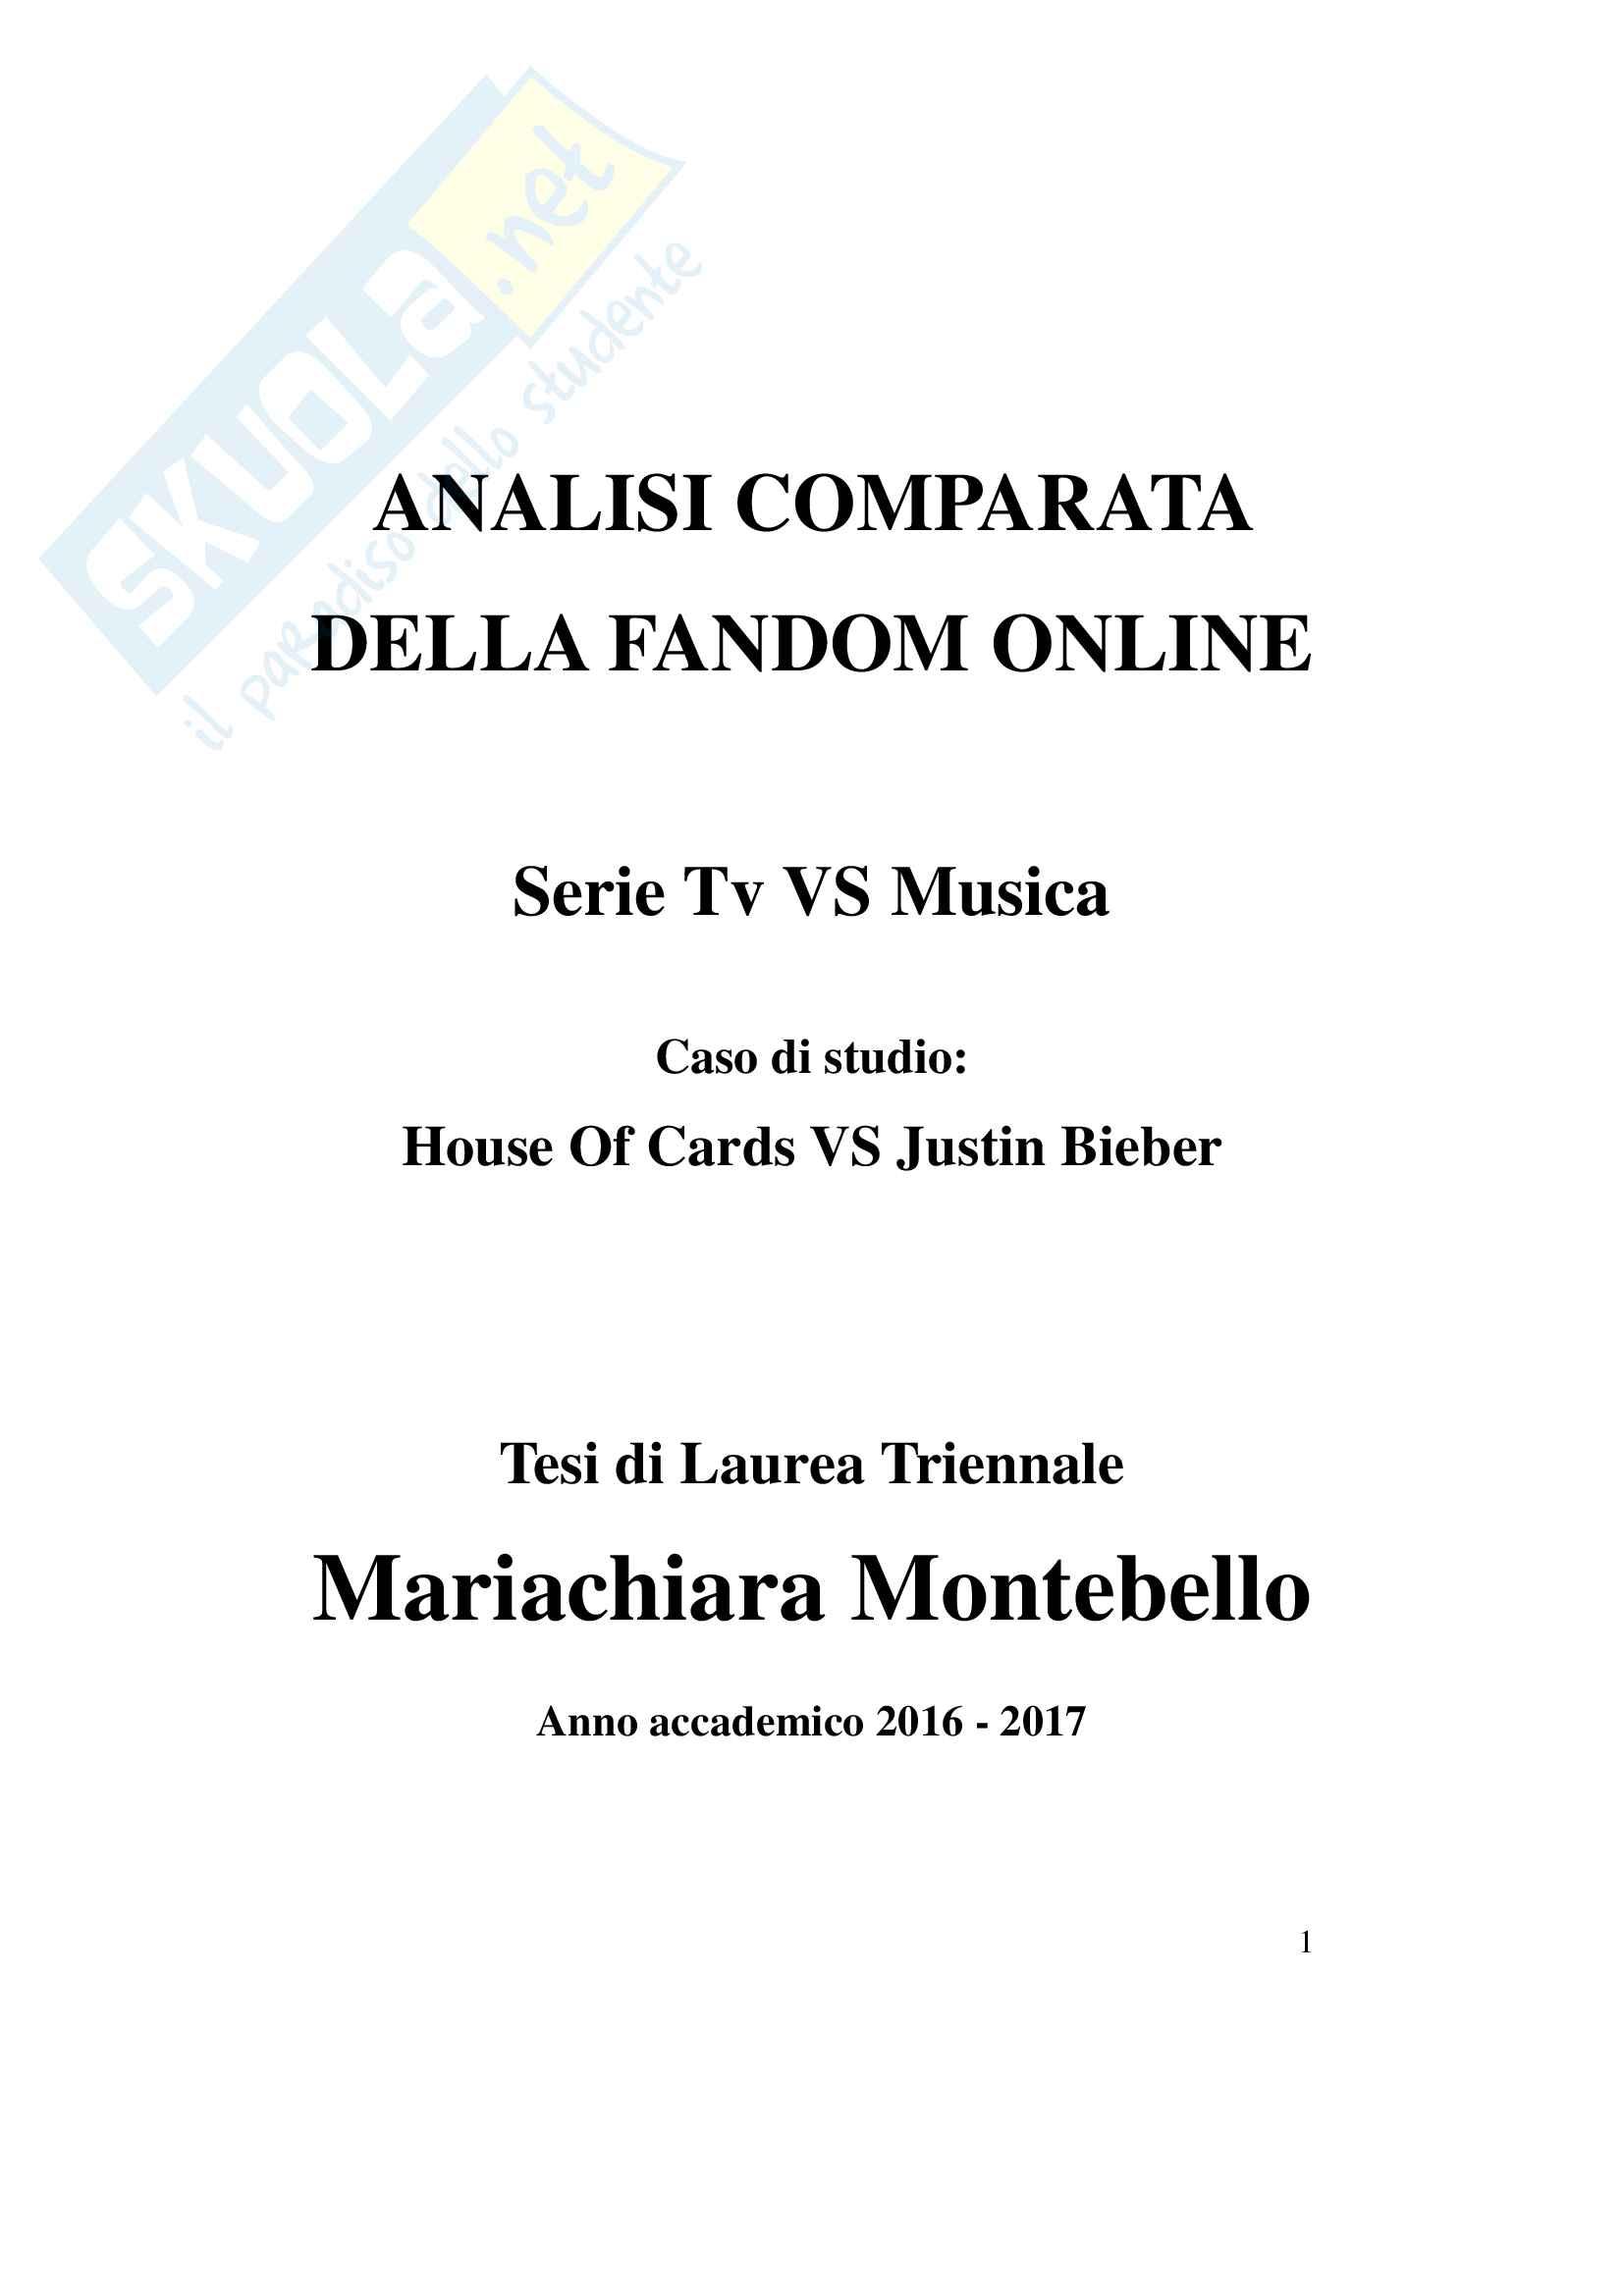 Fandom! Serie tv vs musica: House Of Cards vs Justin Bieber